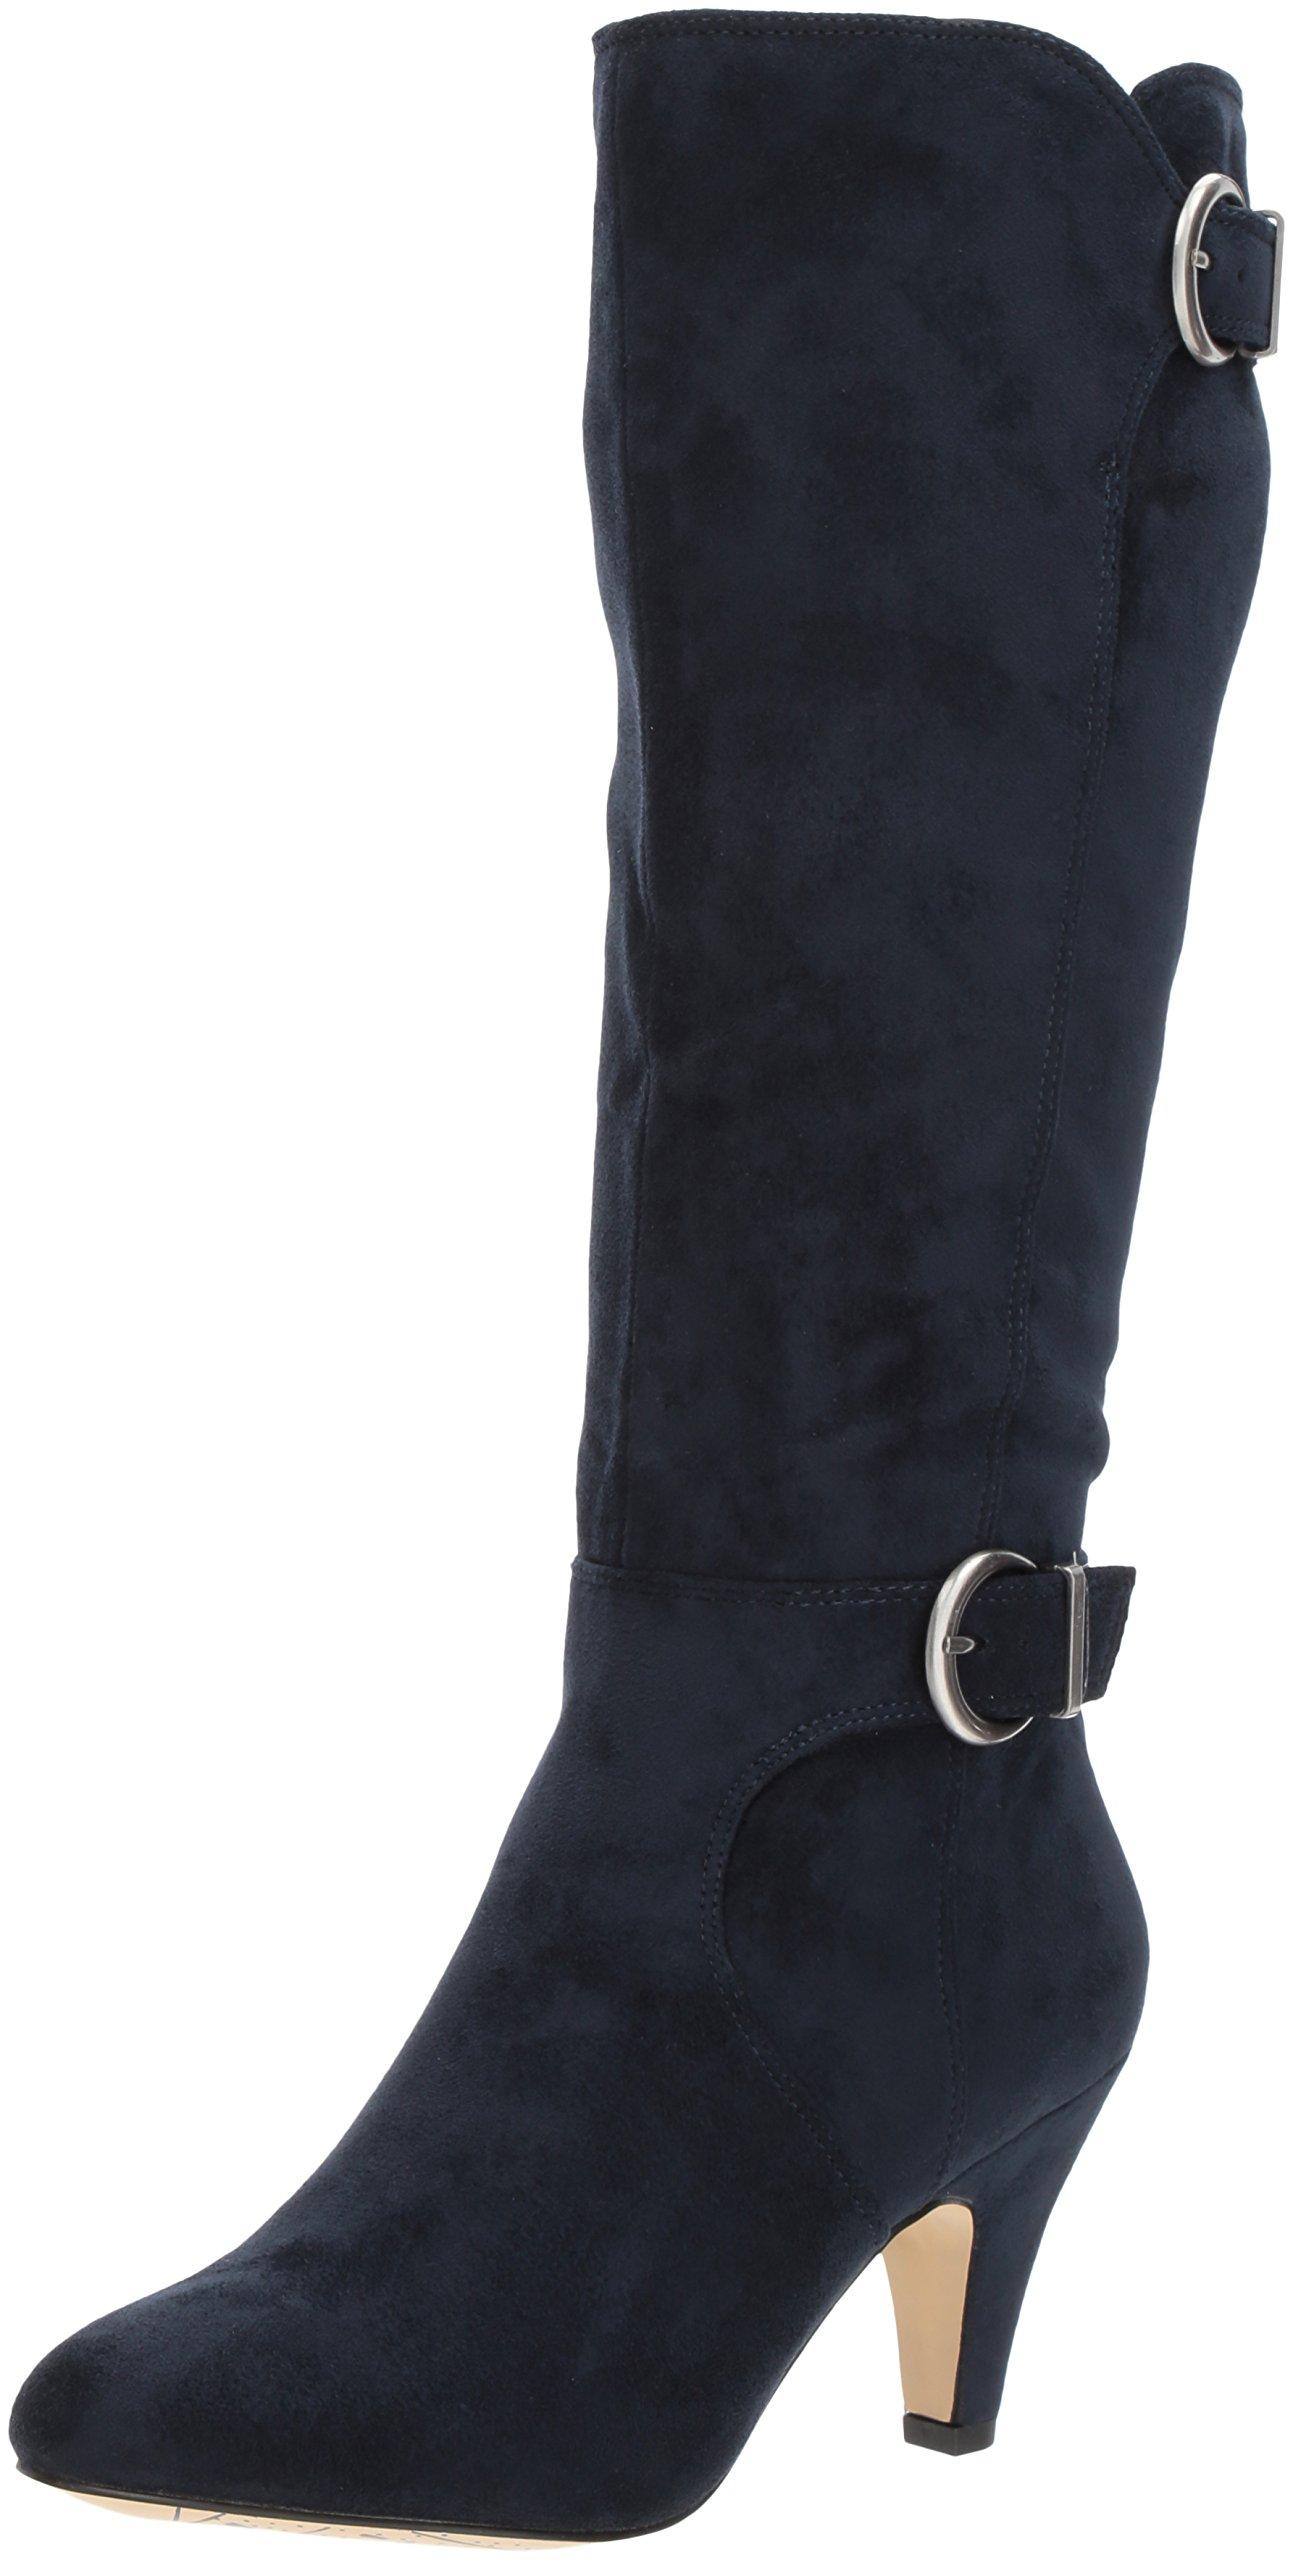 Bella Vita Women's Toni Ii Harness Boot, Navy Super Suede, 7 M US